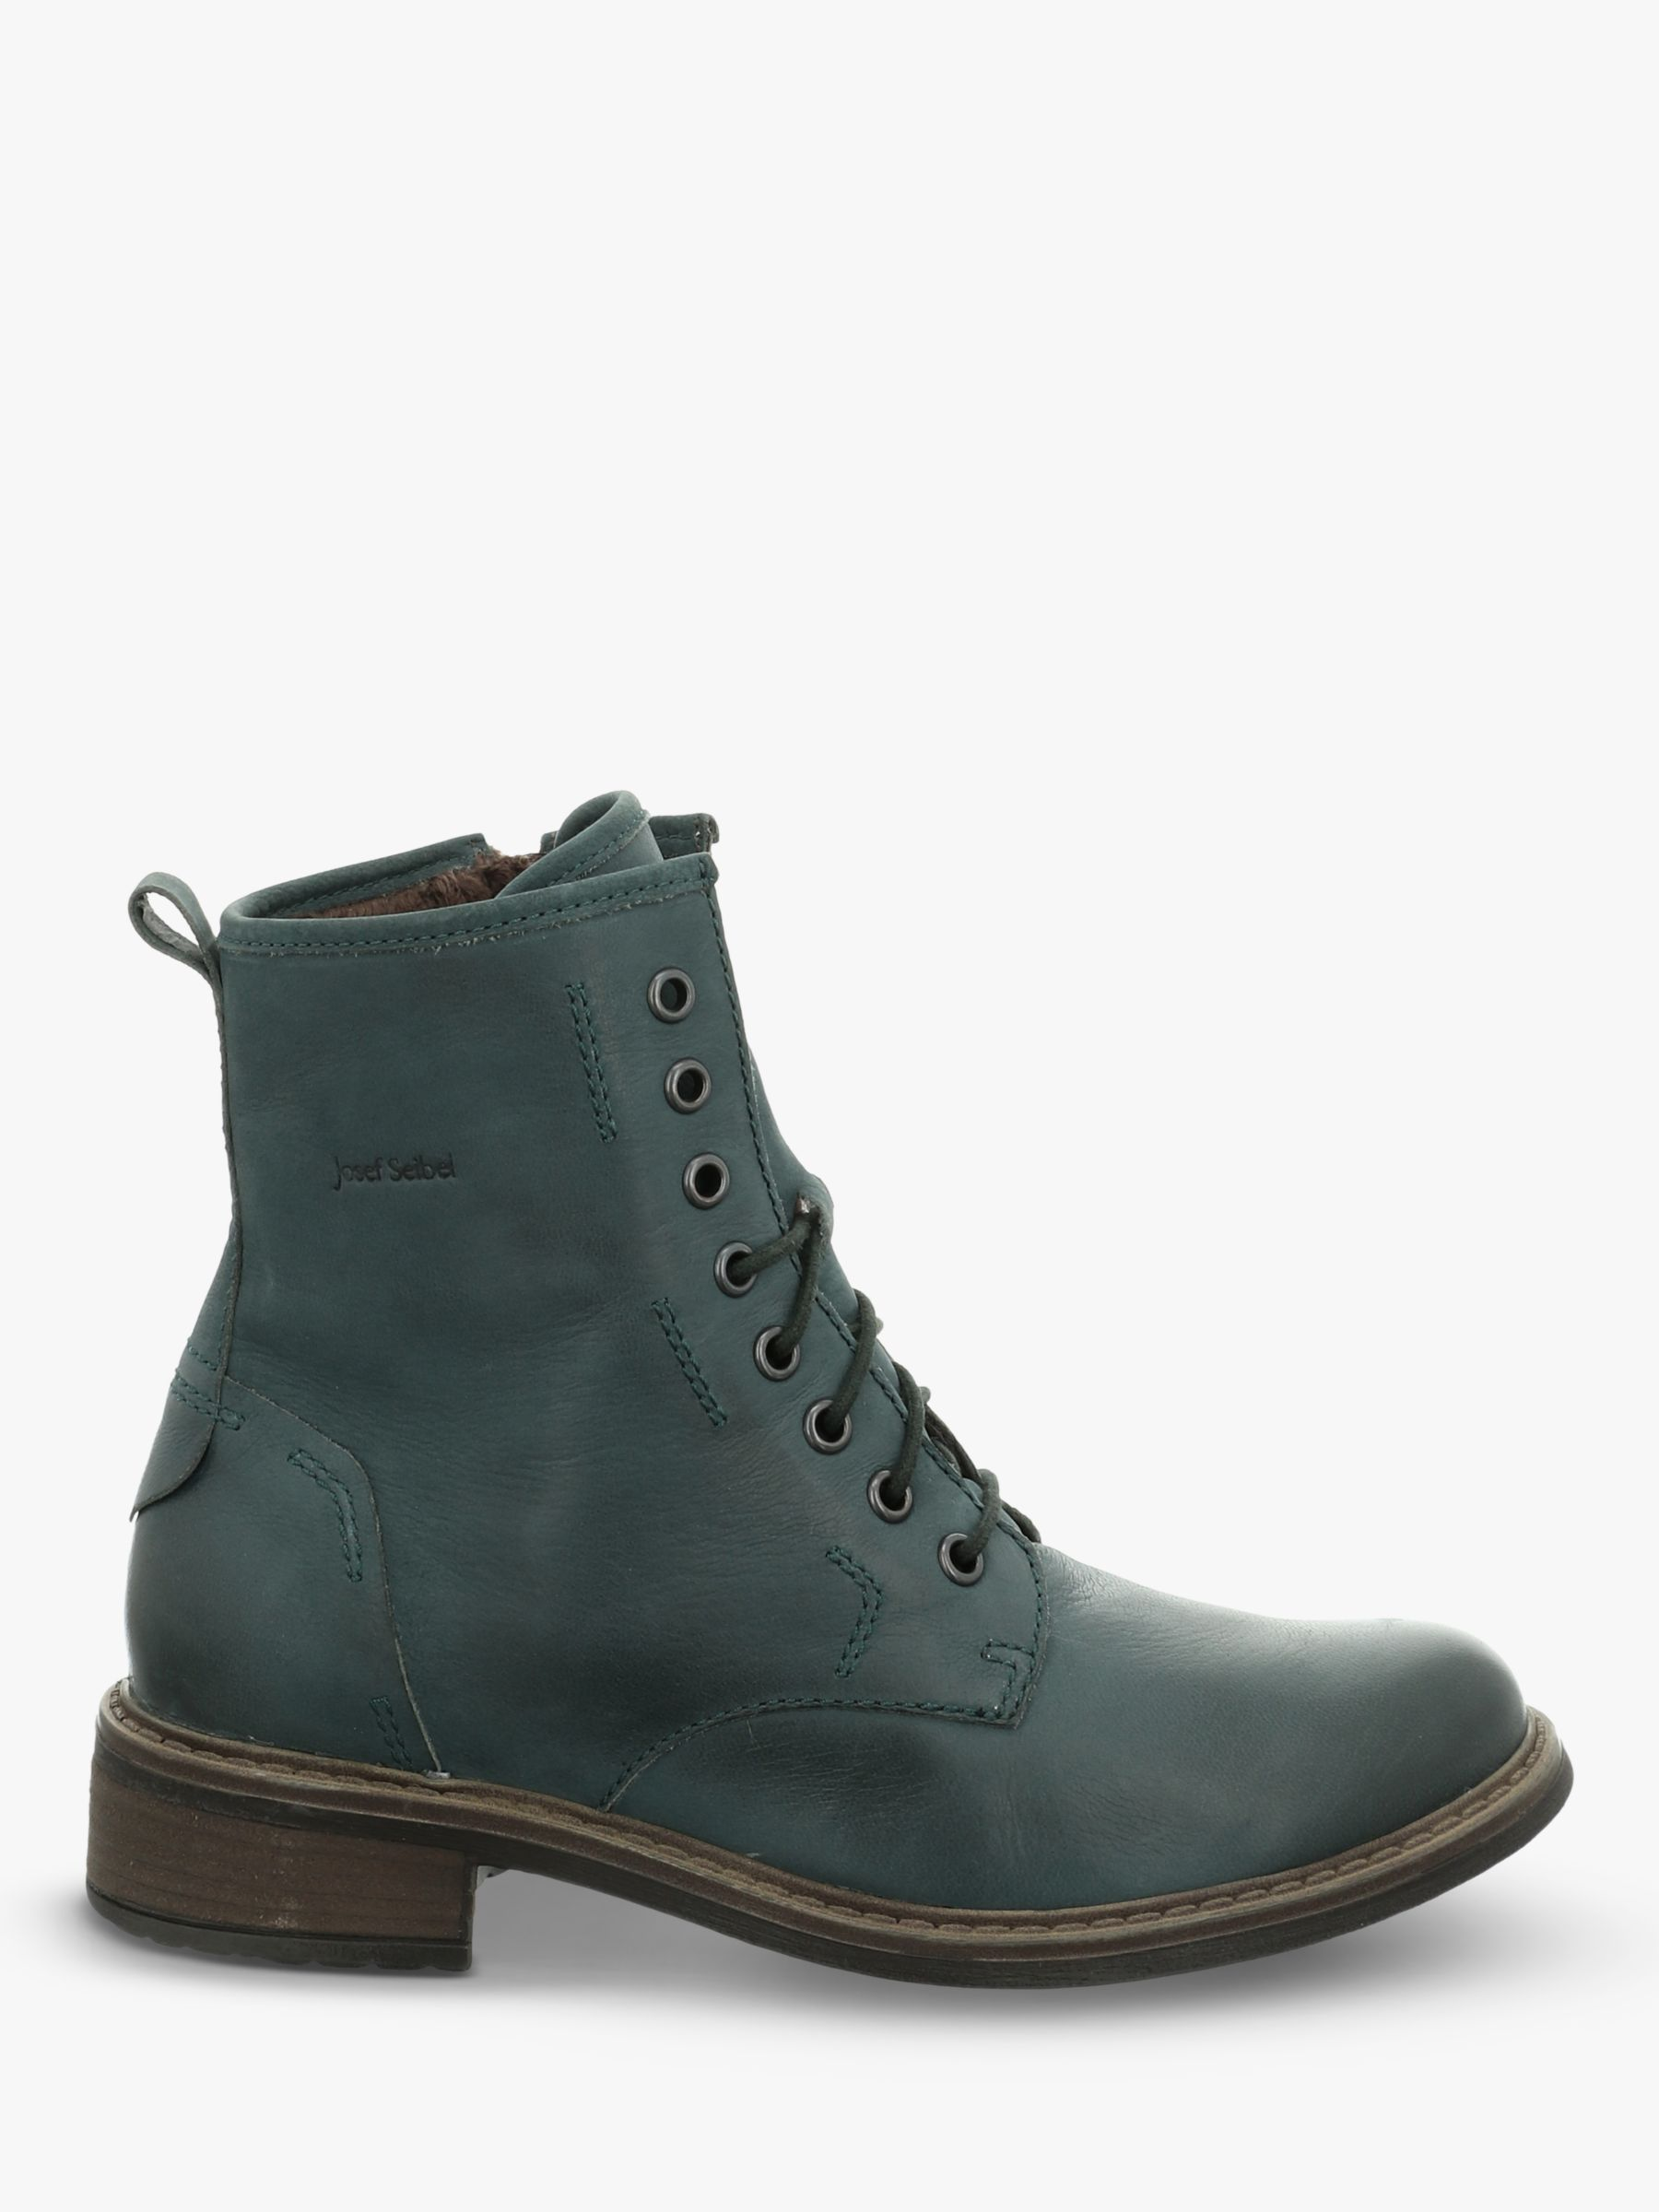 Josef Seibel Josef Seibel Selena 06 Leather High Ankle Boots